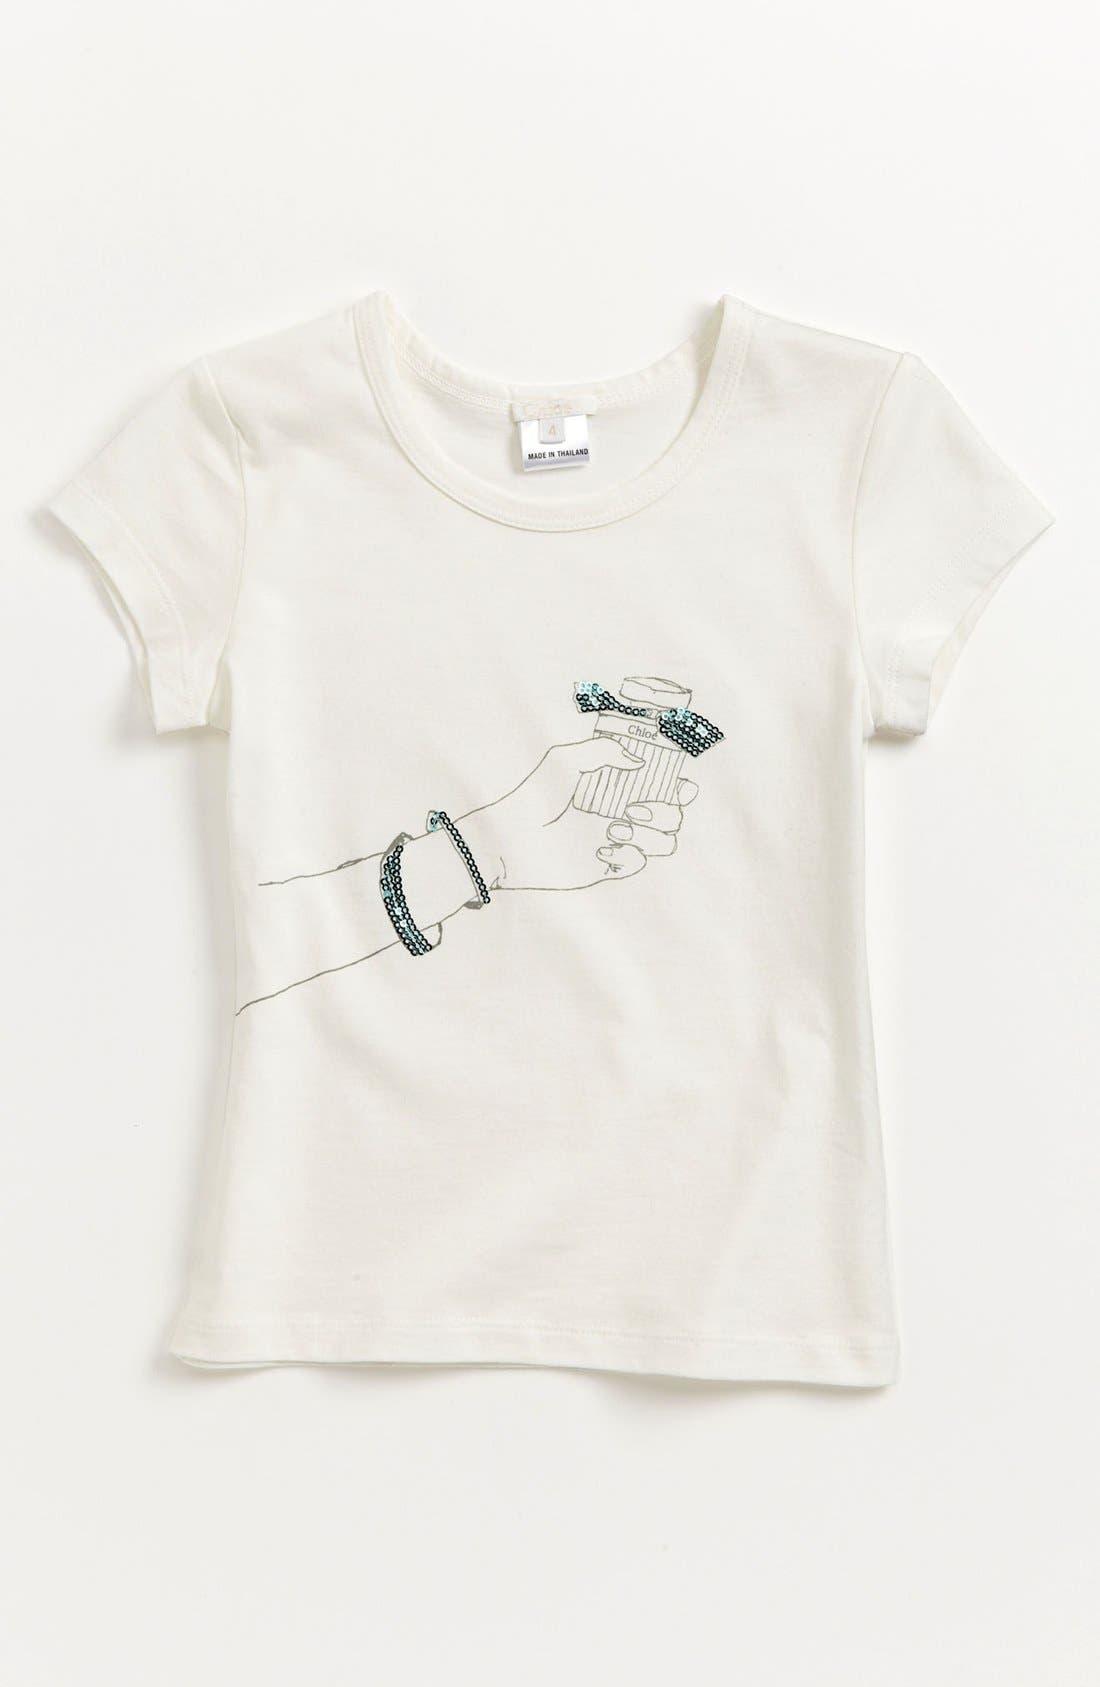 Alternate Image 1 Selected - Chloé Print Tee (Toddler, Little Girls & Big Girls)